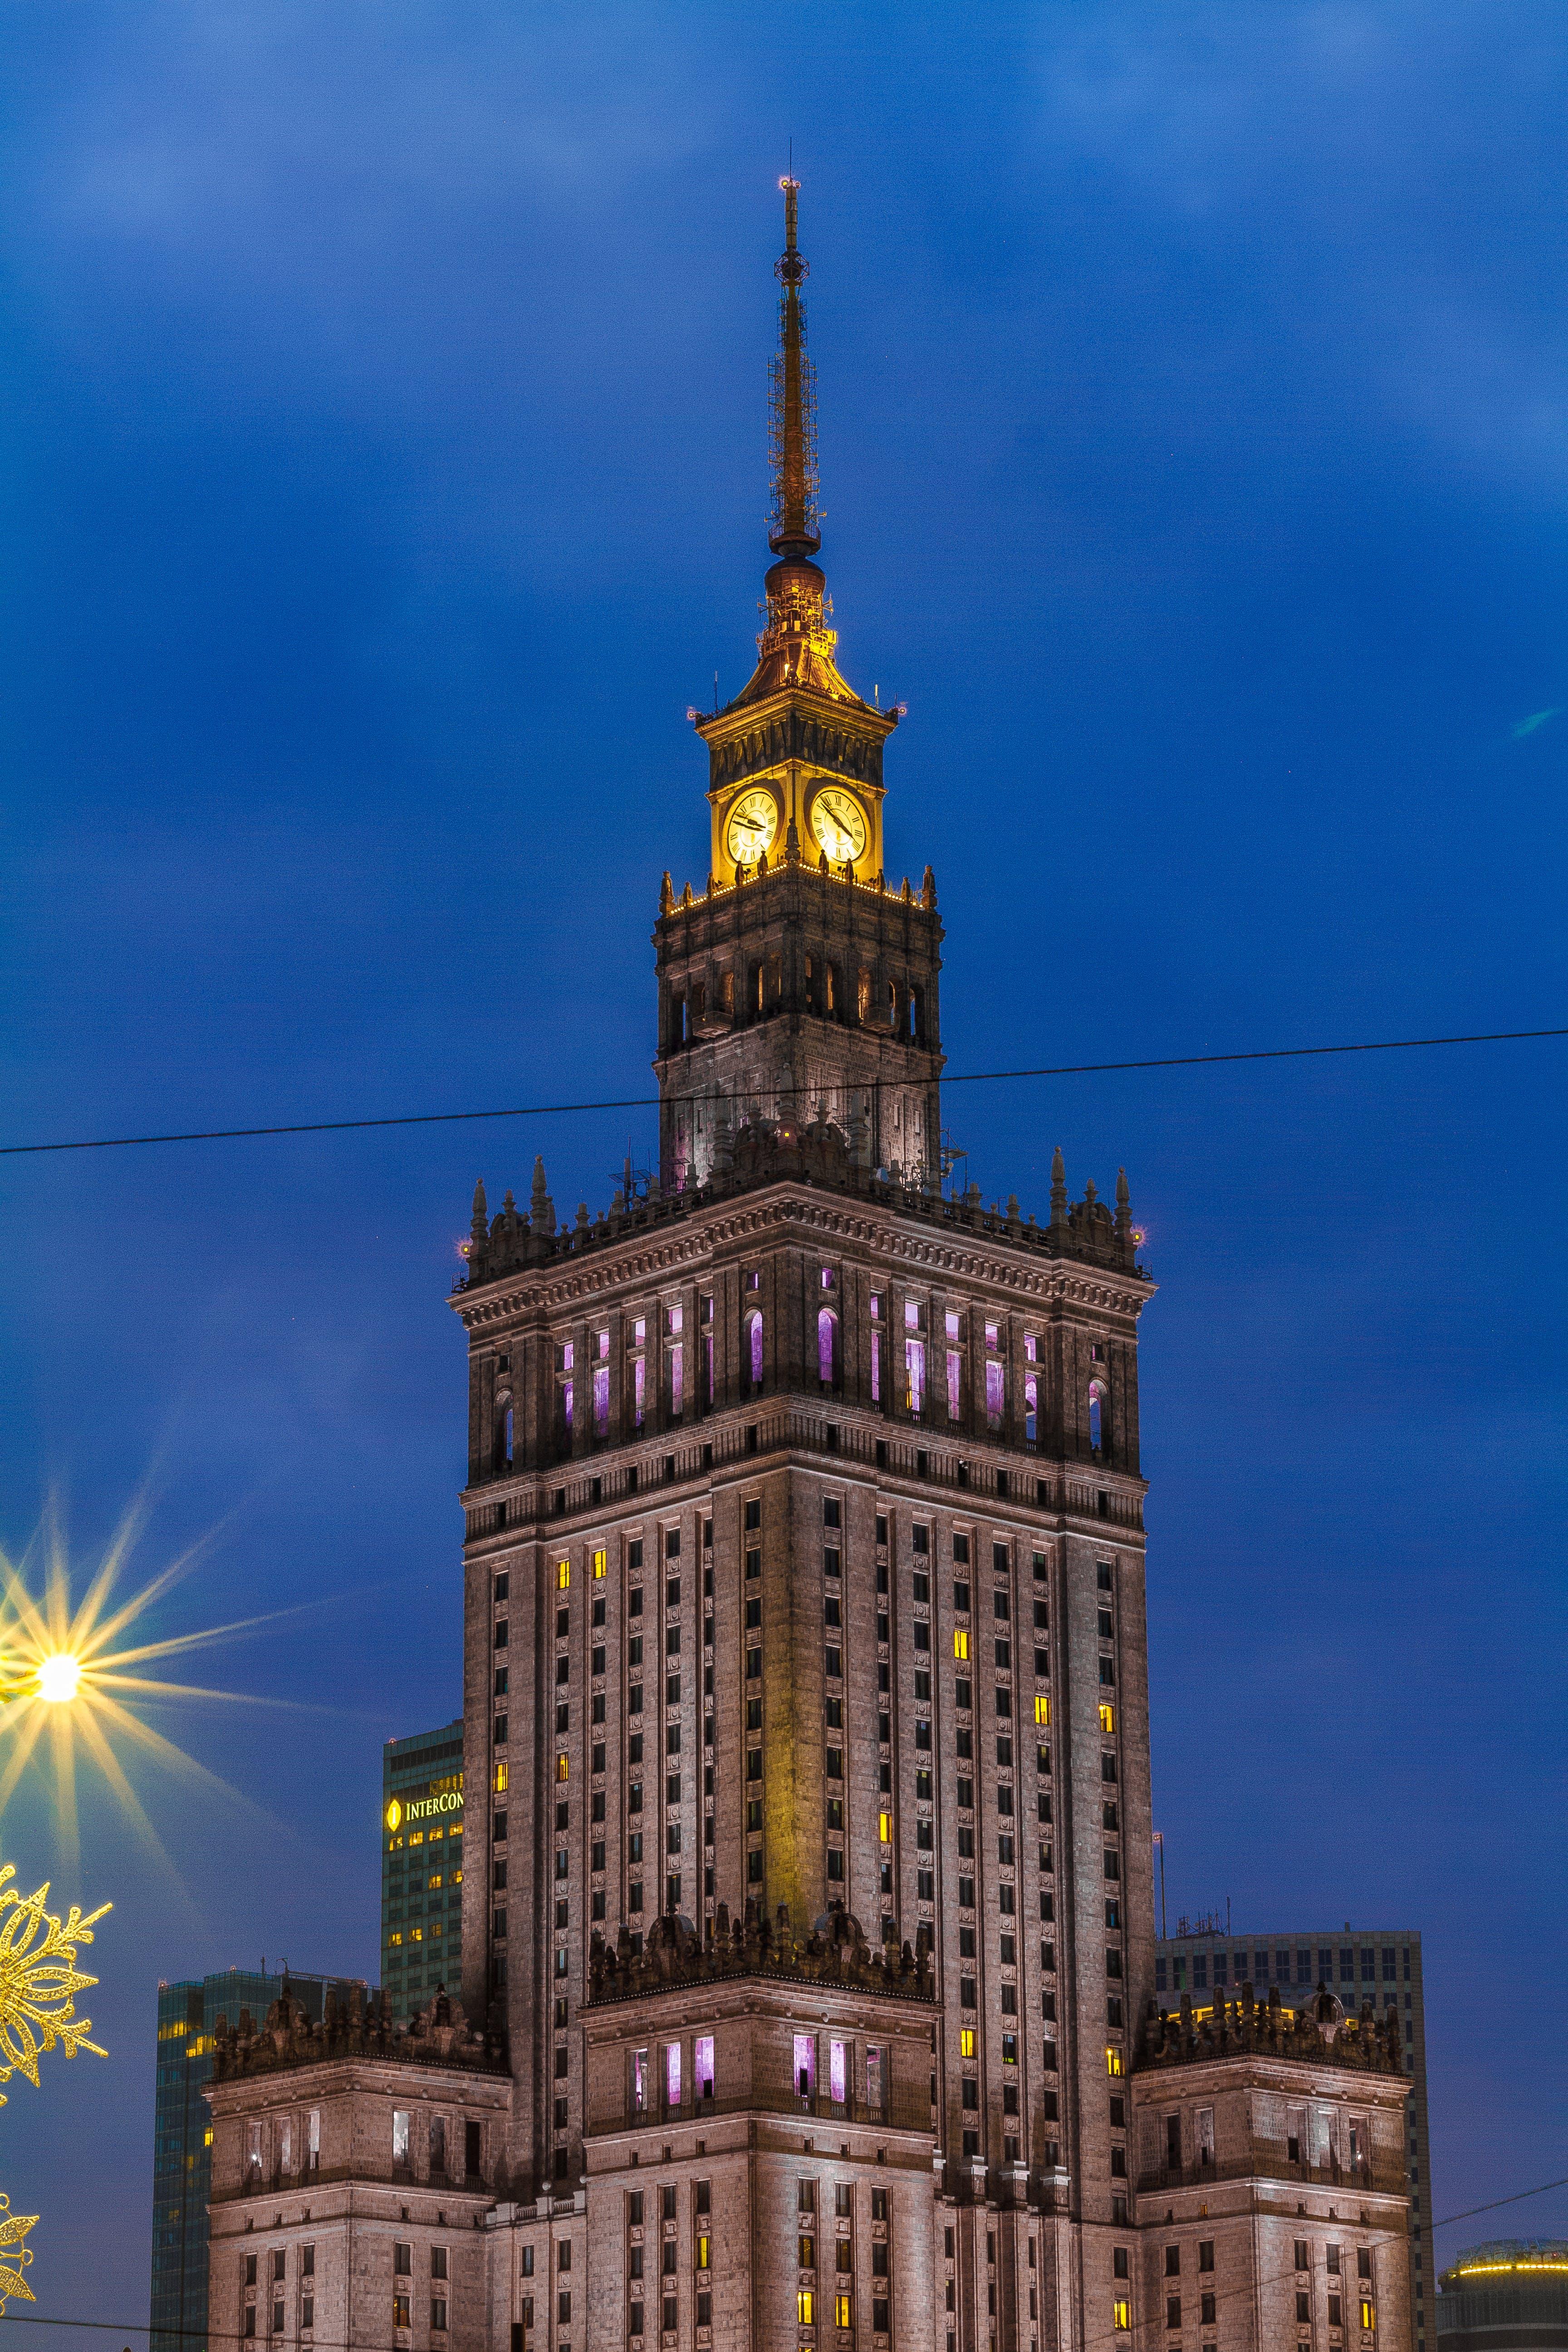 Free stock photo of architecture, building, modernism, palac kultury i nauki